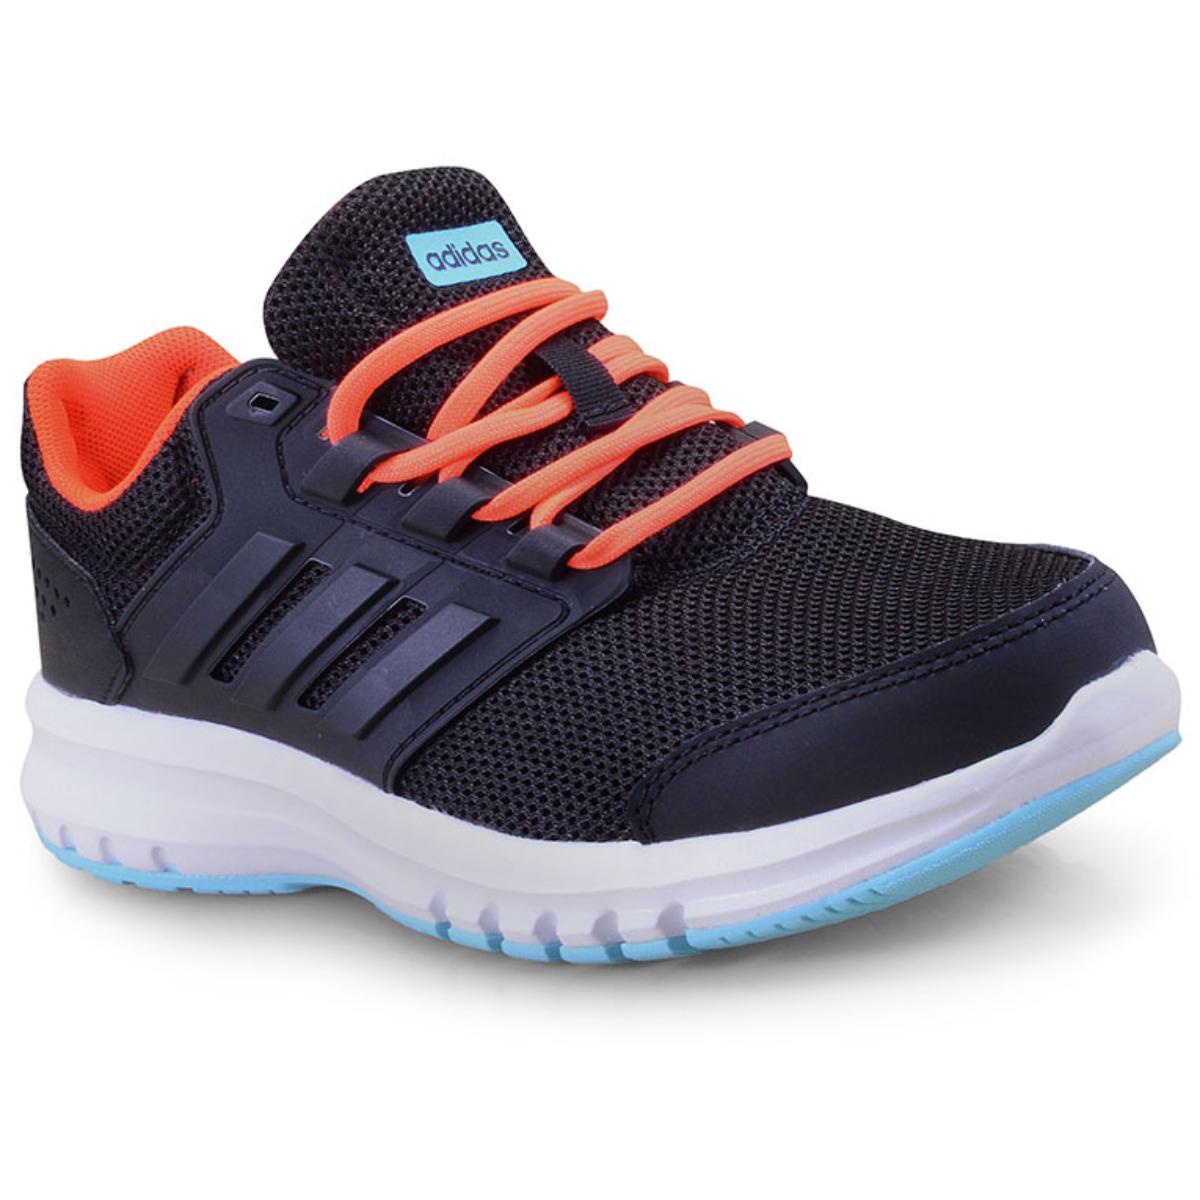 Tênis Feminino Adidas B75656 Galaxy 4k Preto/laranja